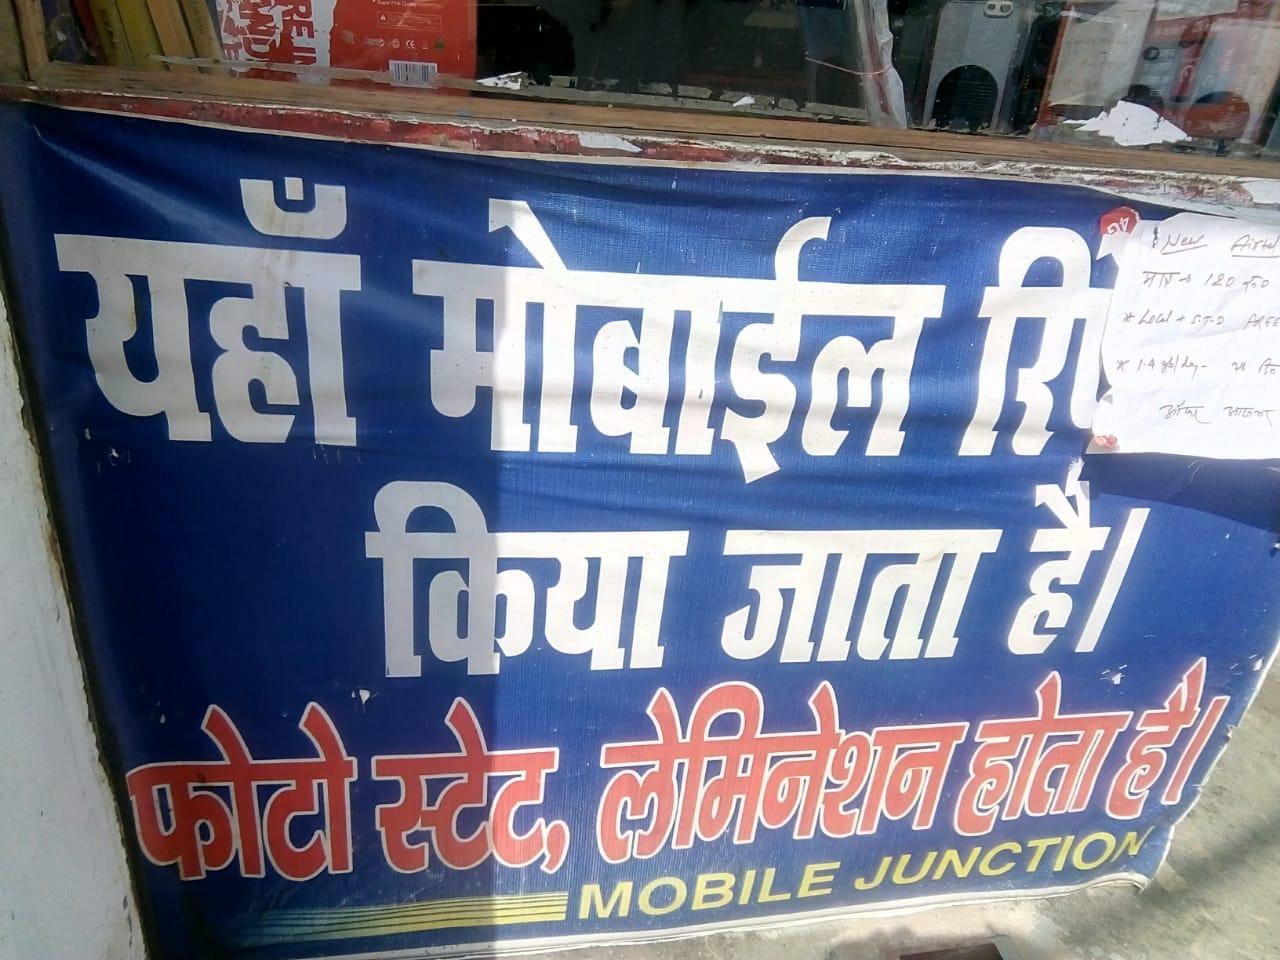 Mobile-Junction3